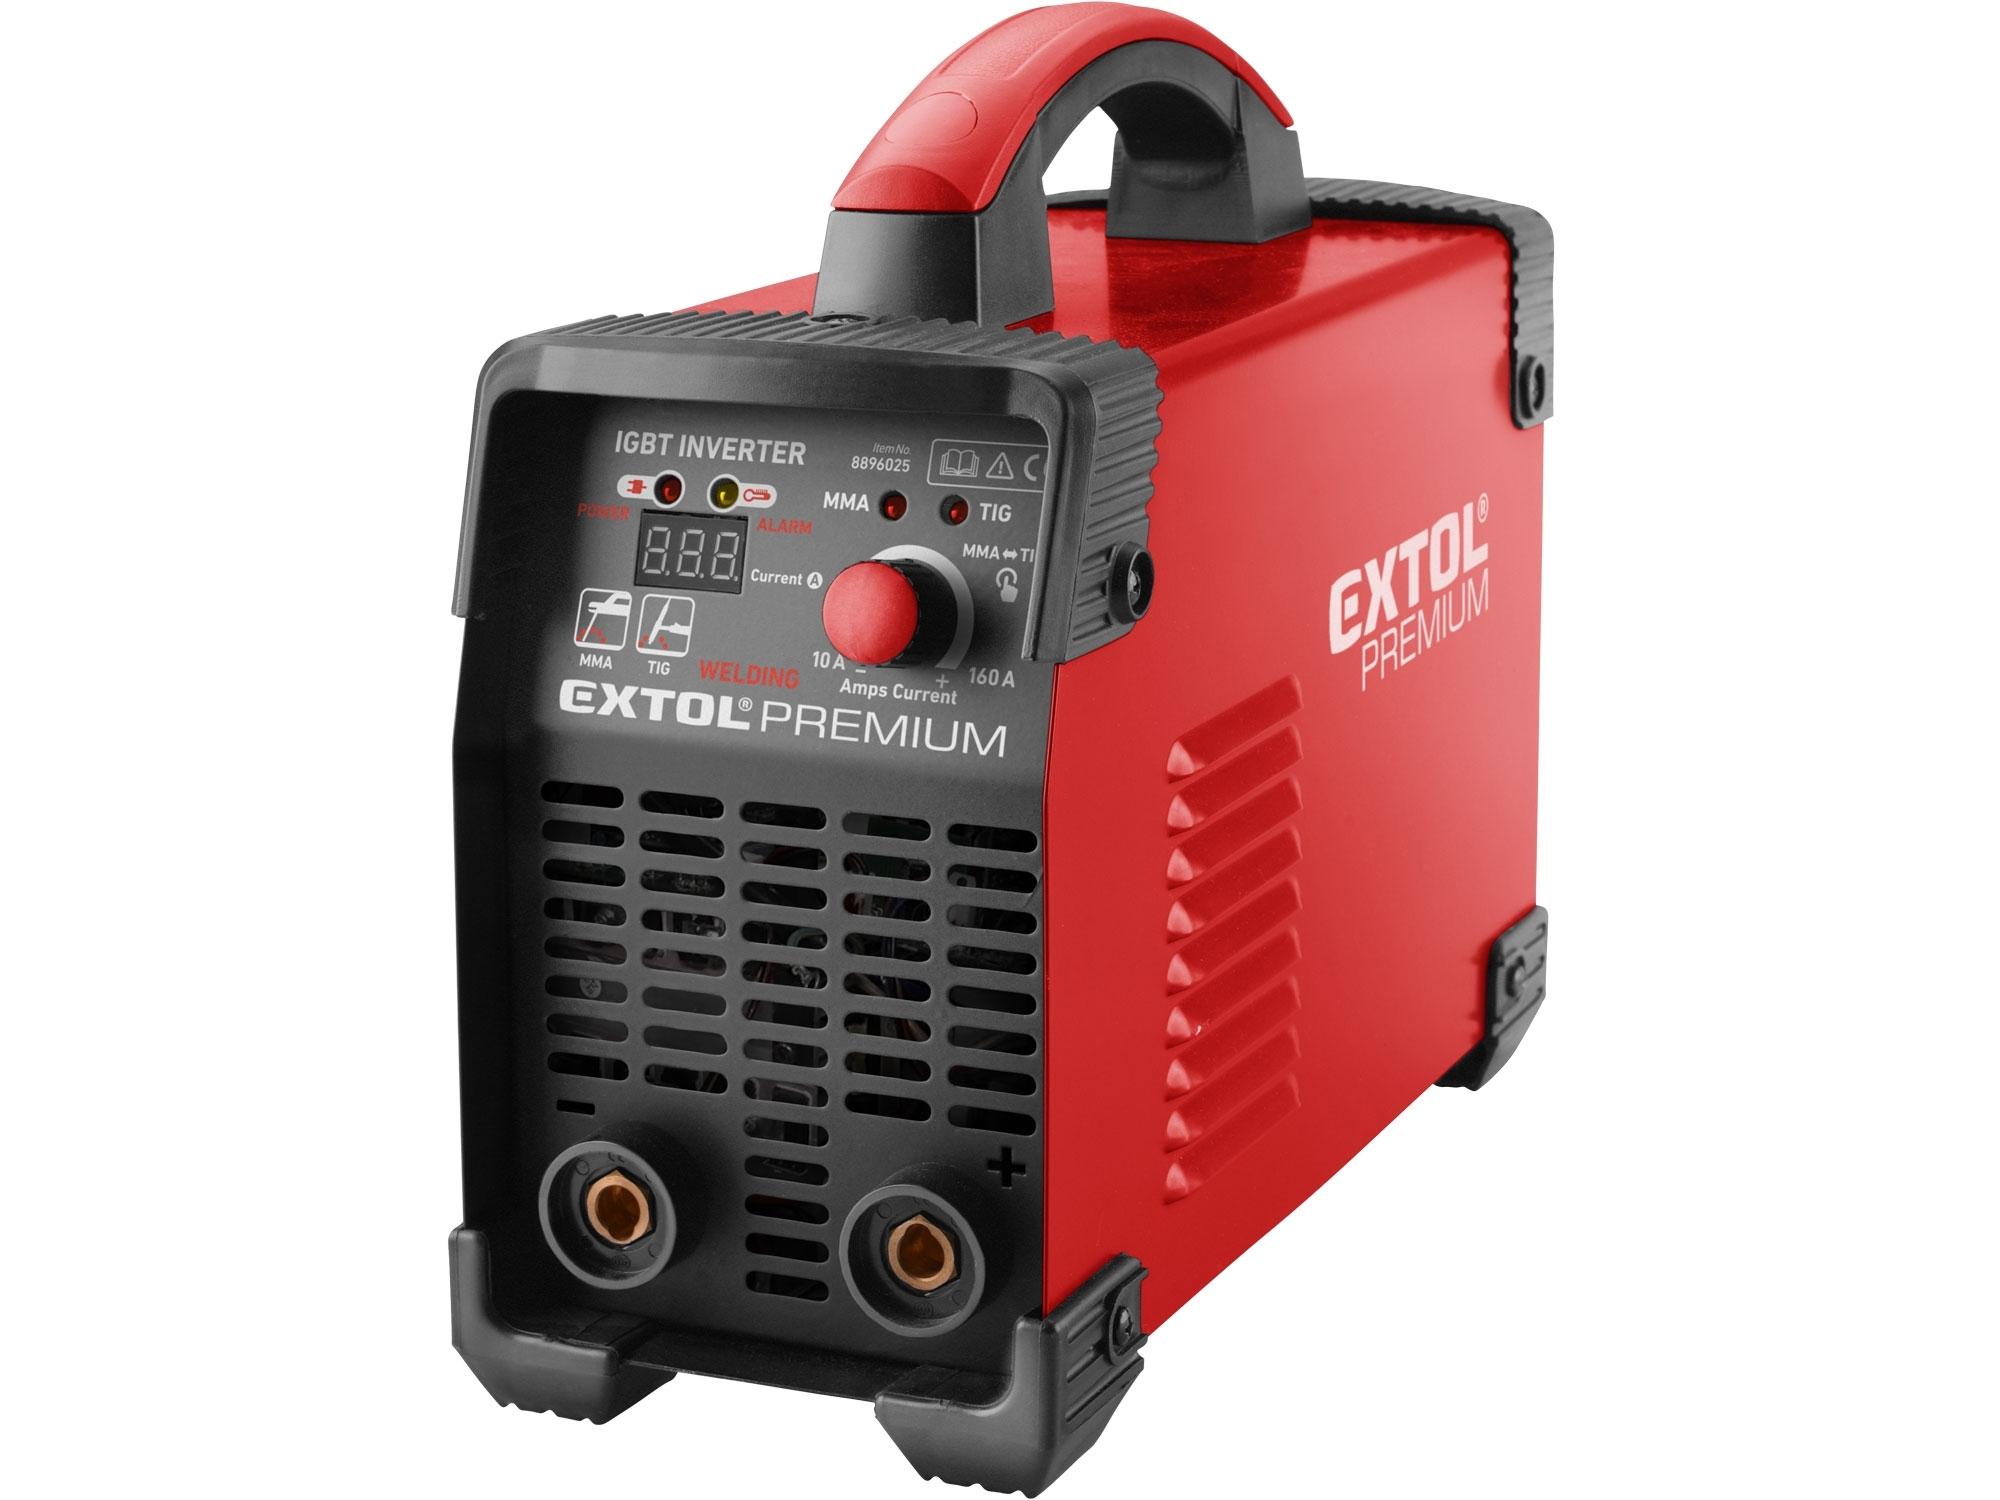 Invertor svařovací 160A EXTOL PREMIUM 8896025